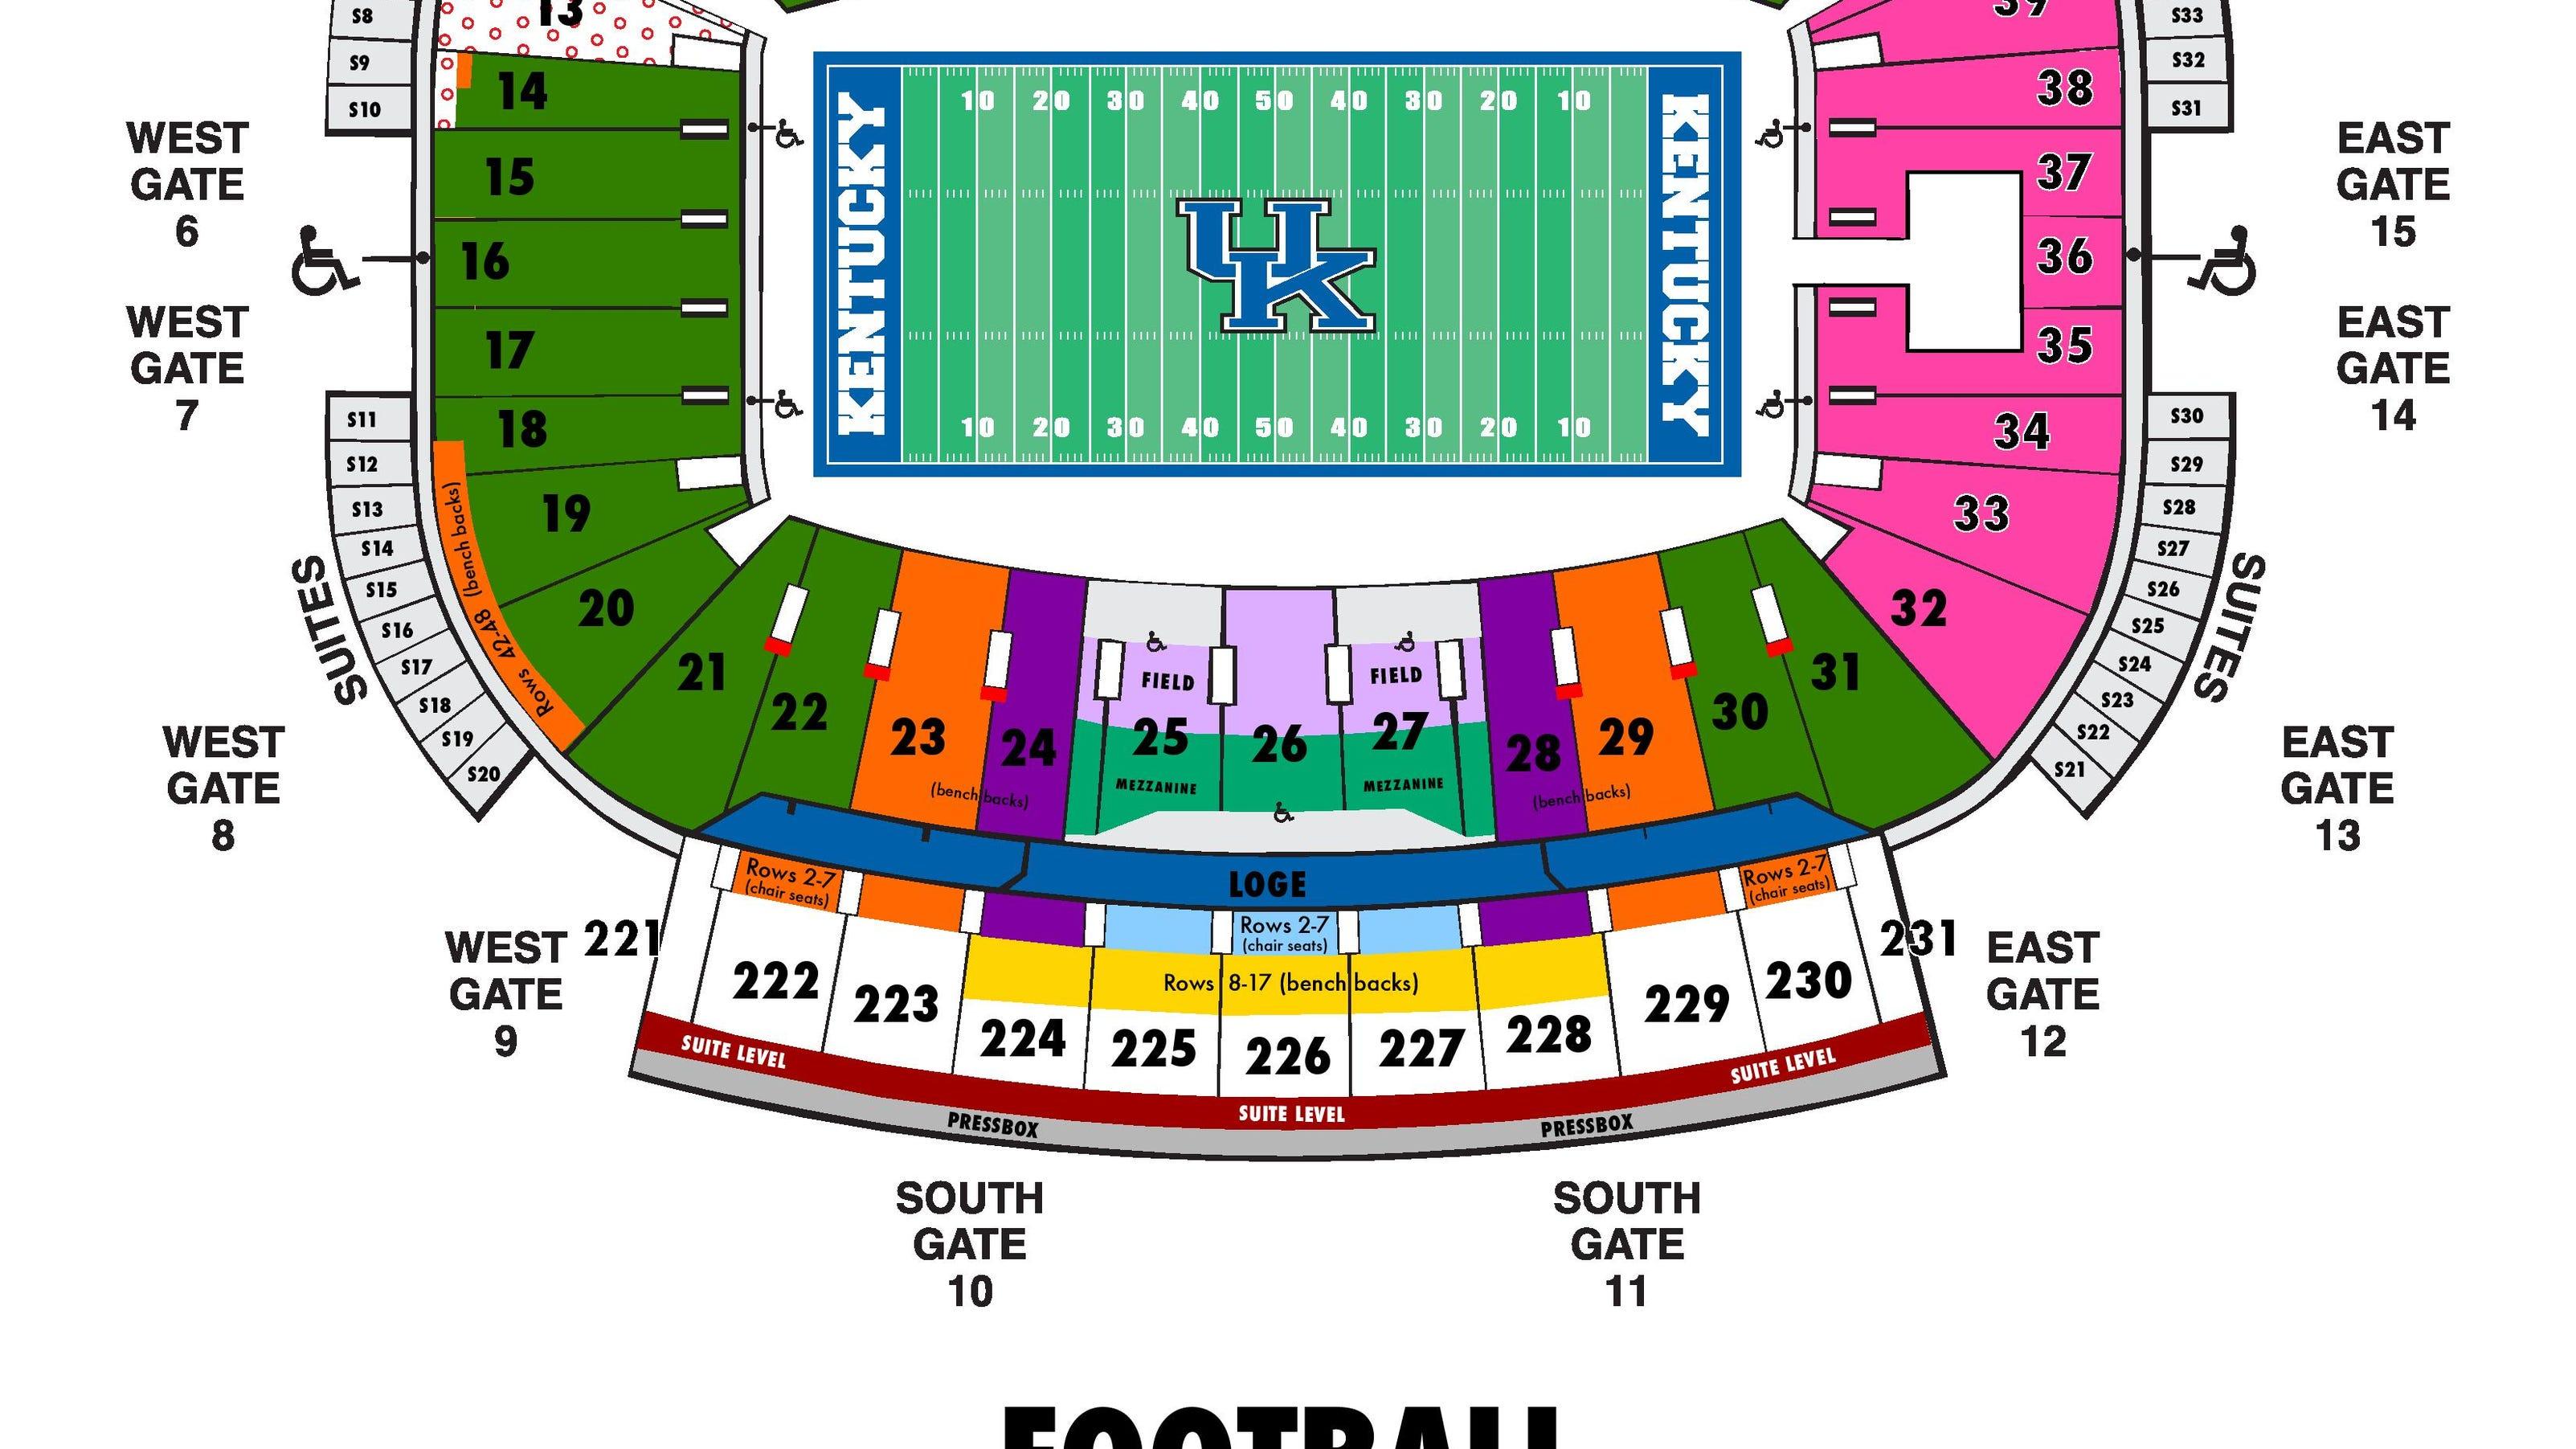 2015 Kentucky football season tickets on sale to 'The New ...